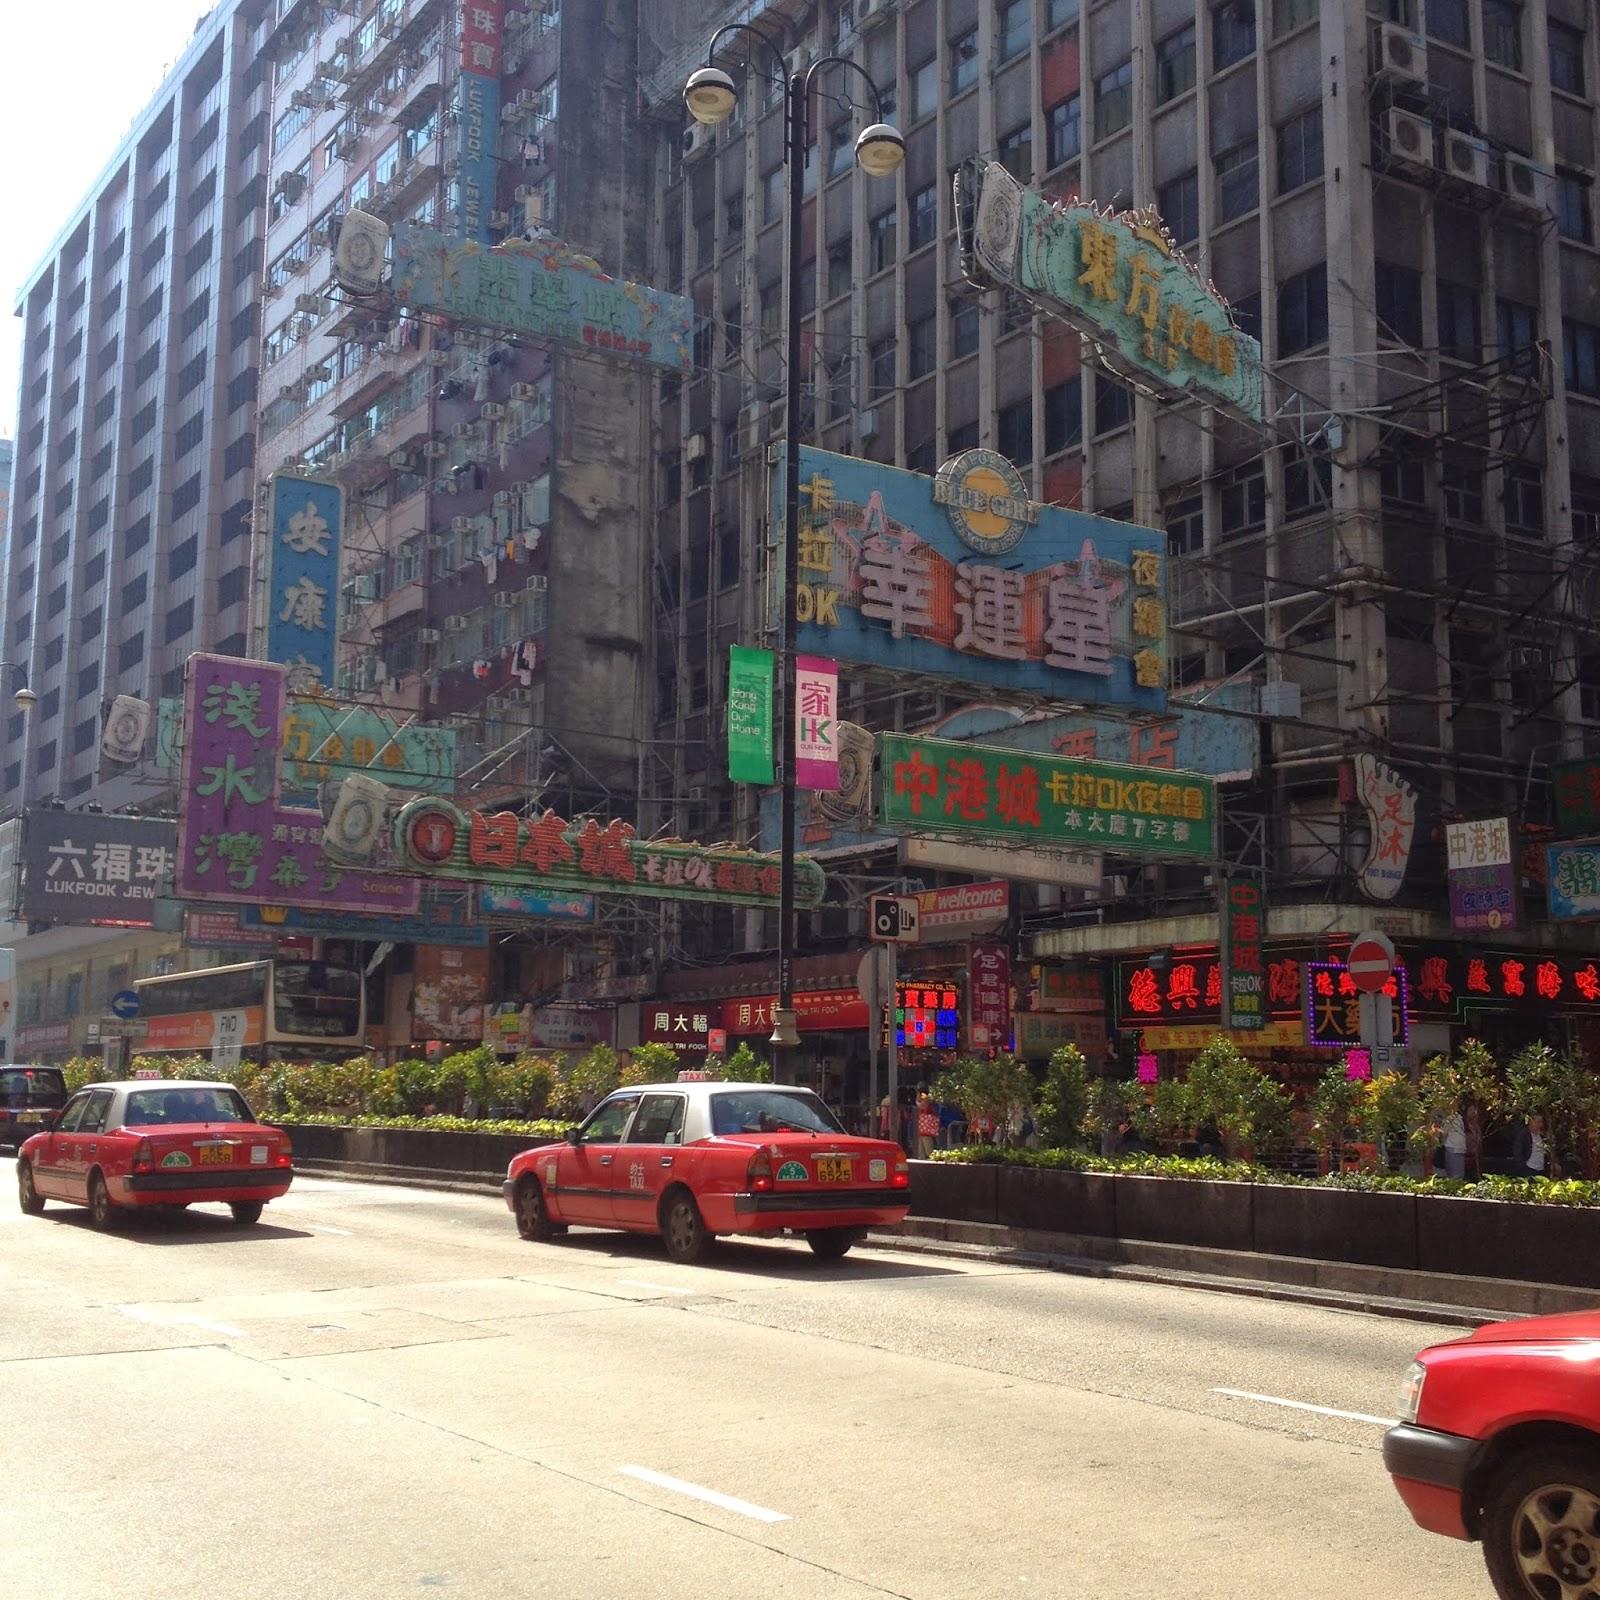 Eating & Shopping in Hong Kong!